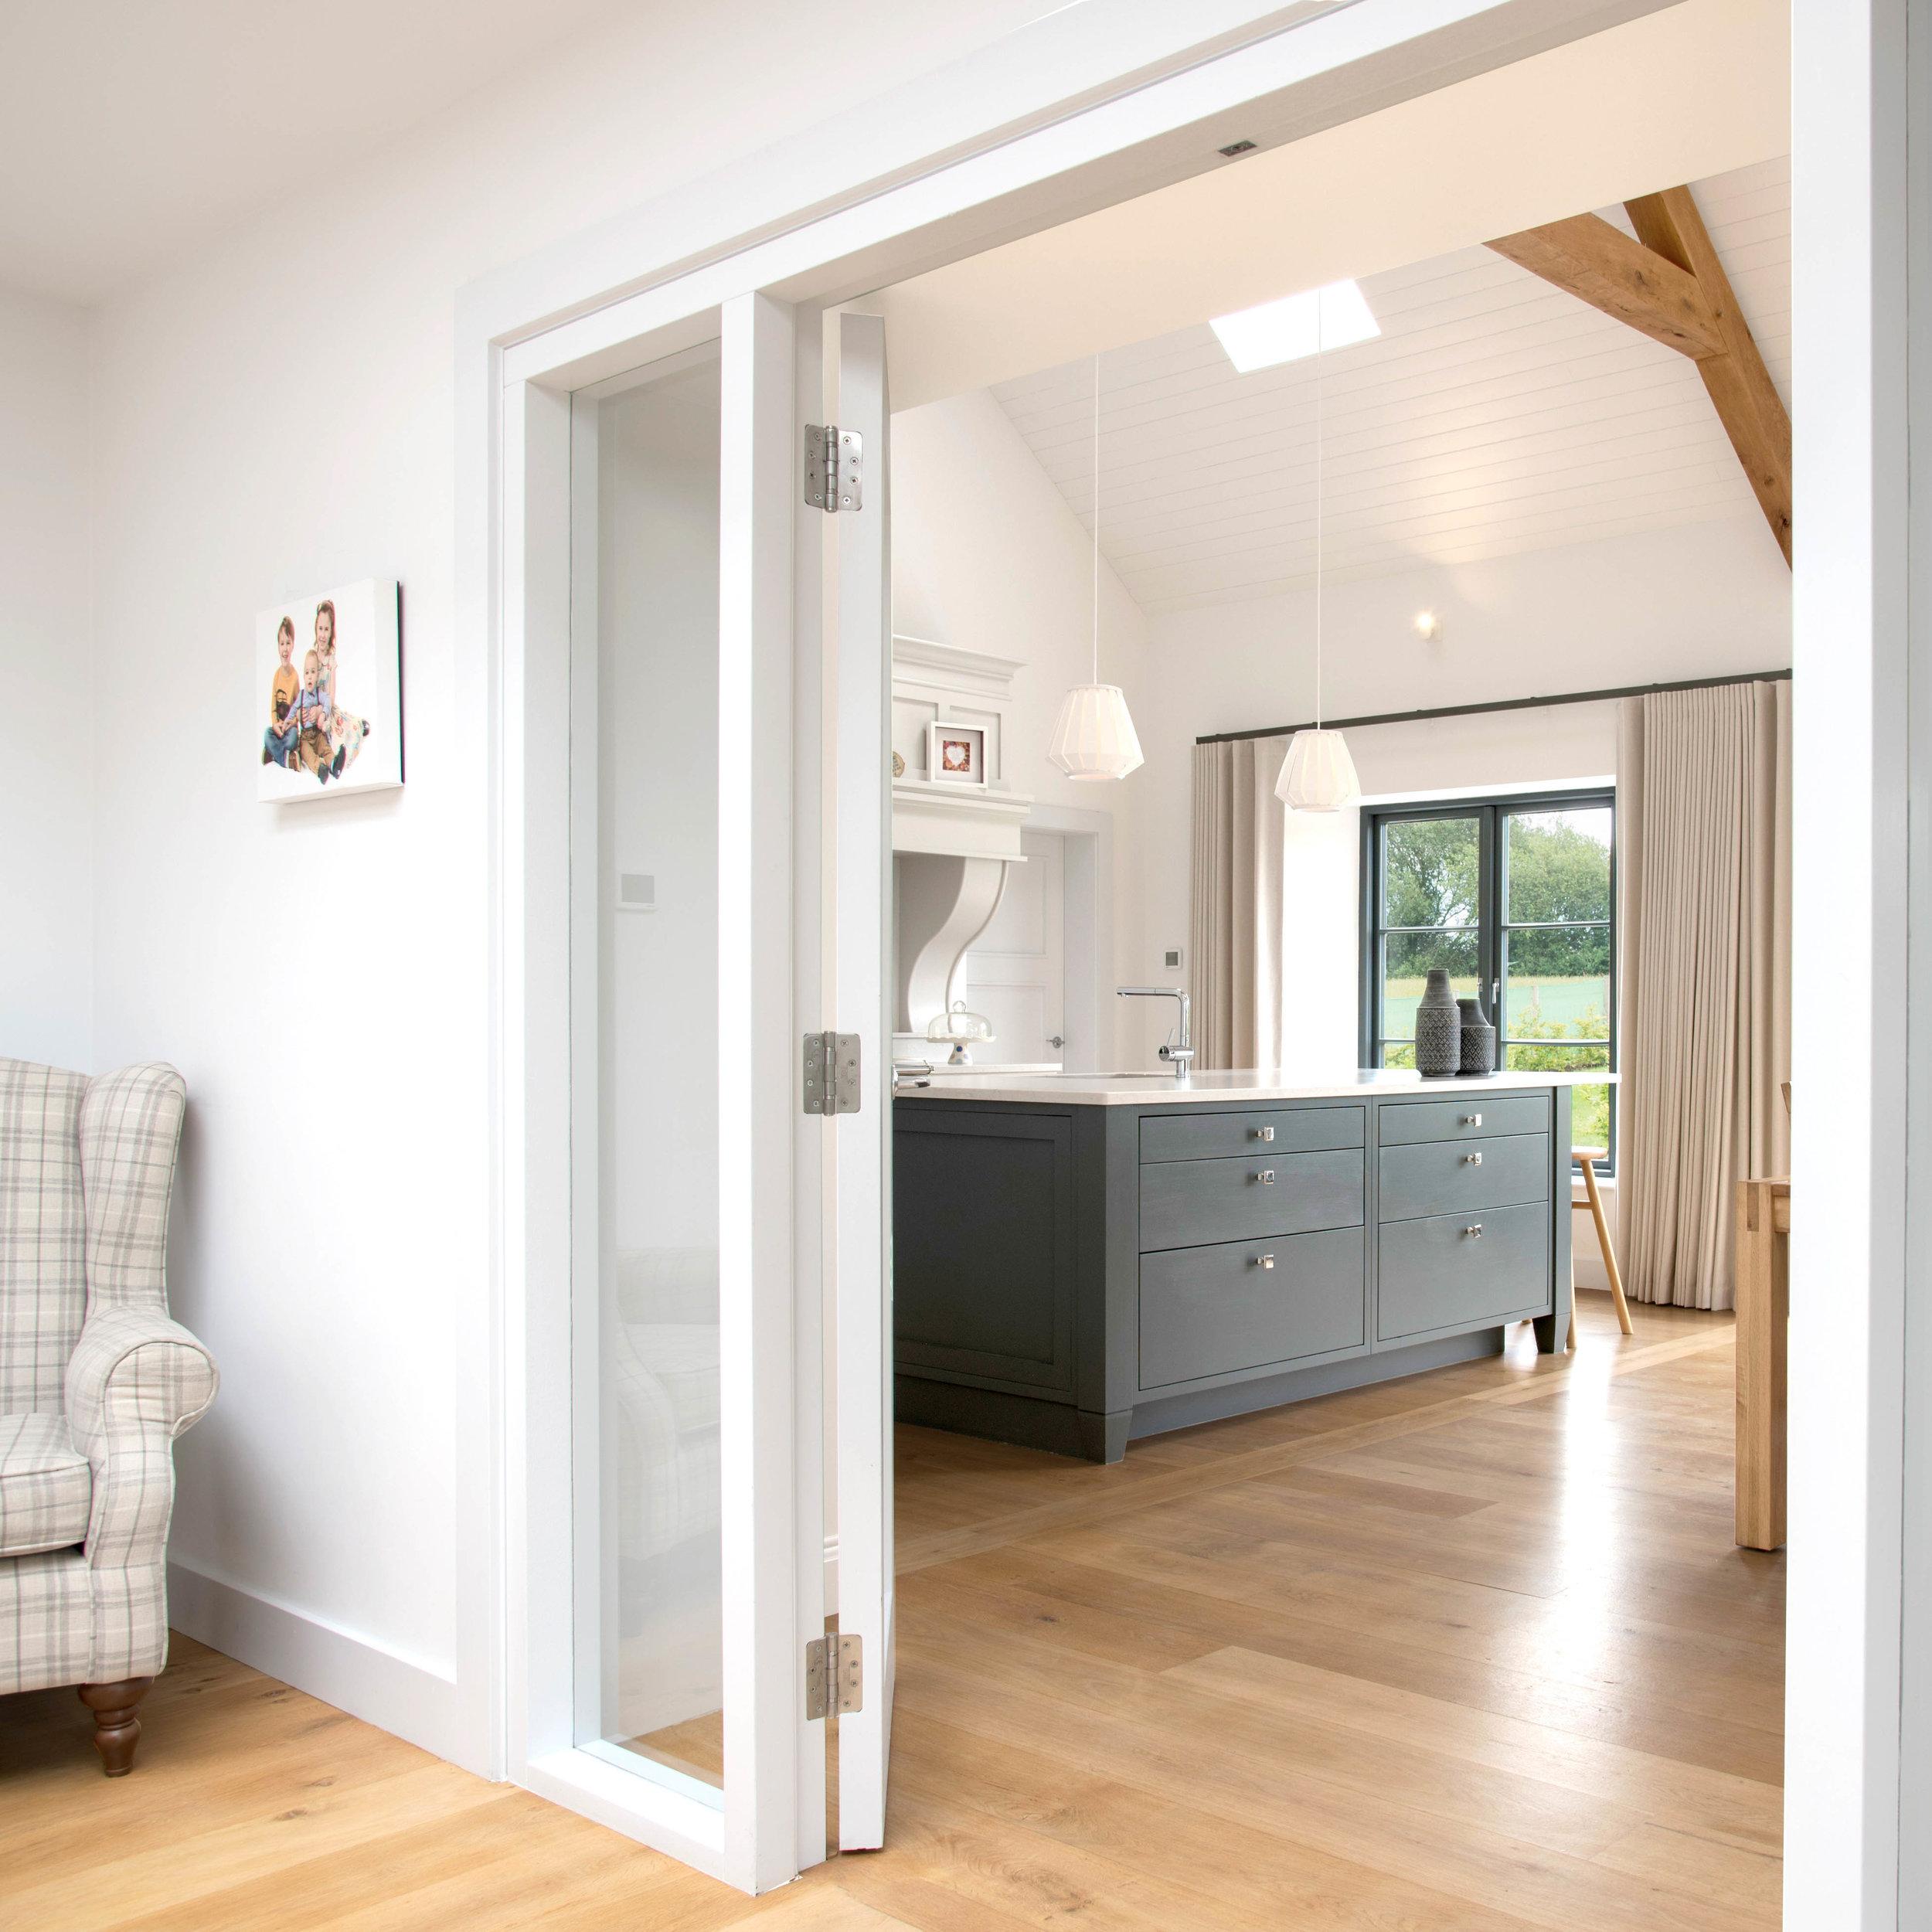 Paul_McAlister_Architects_Entrance_kitchen-1.jpg